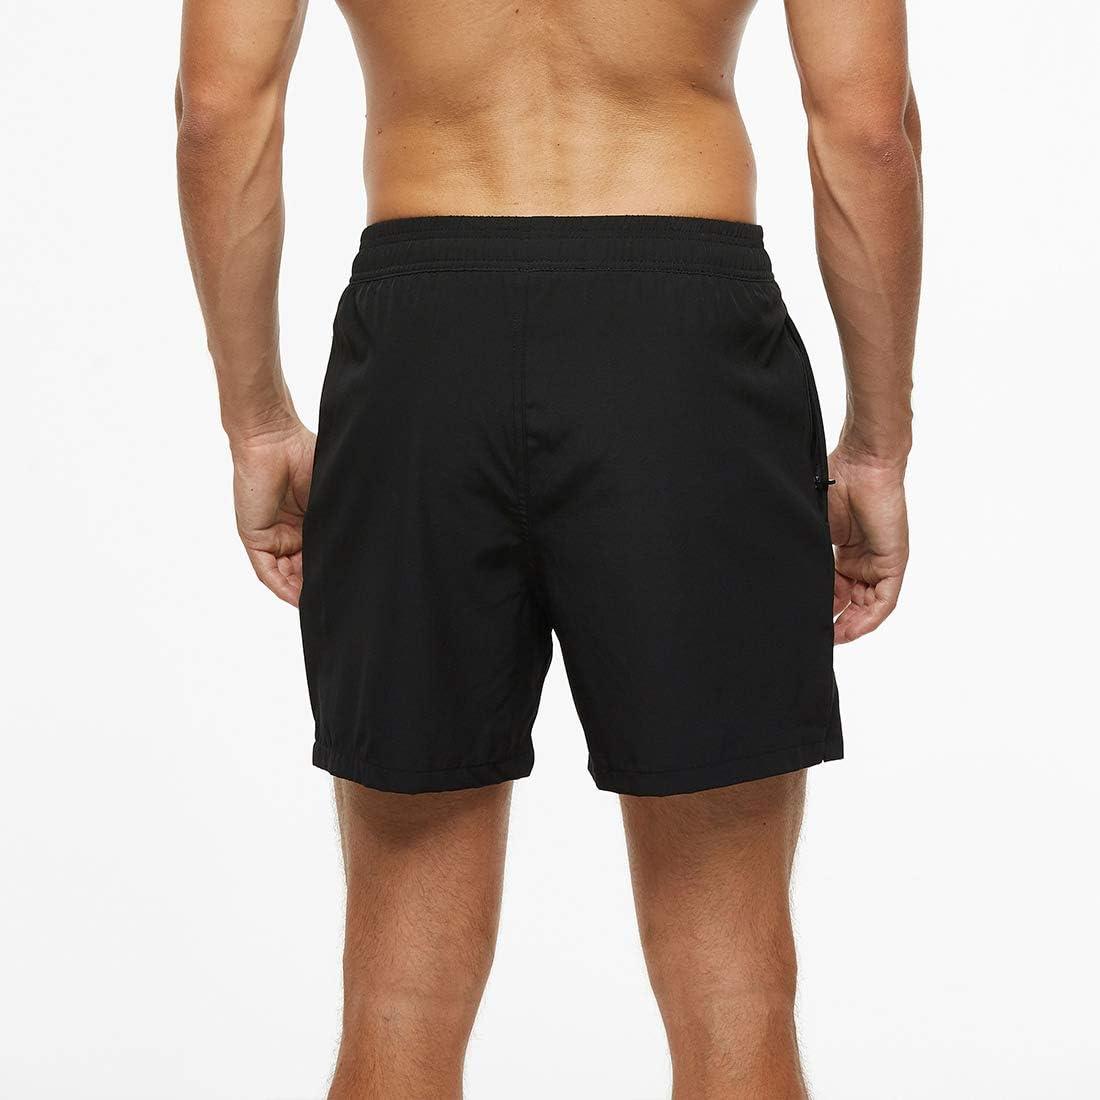 FEOYA Mens Quick Dry Swim Shorts with Mesh Ling Zipper Pockets for Surfing Beach Sun Bathing US XS-US XL